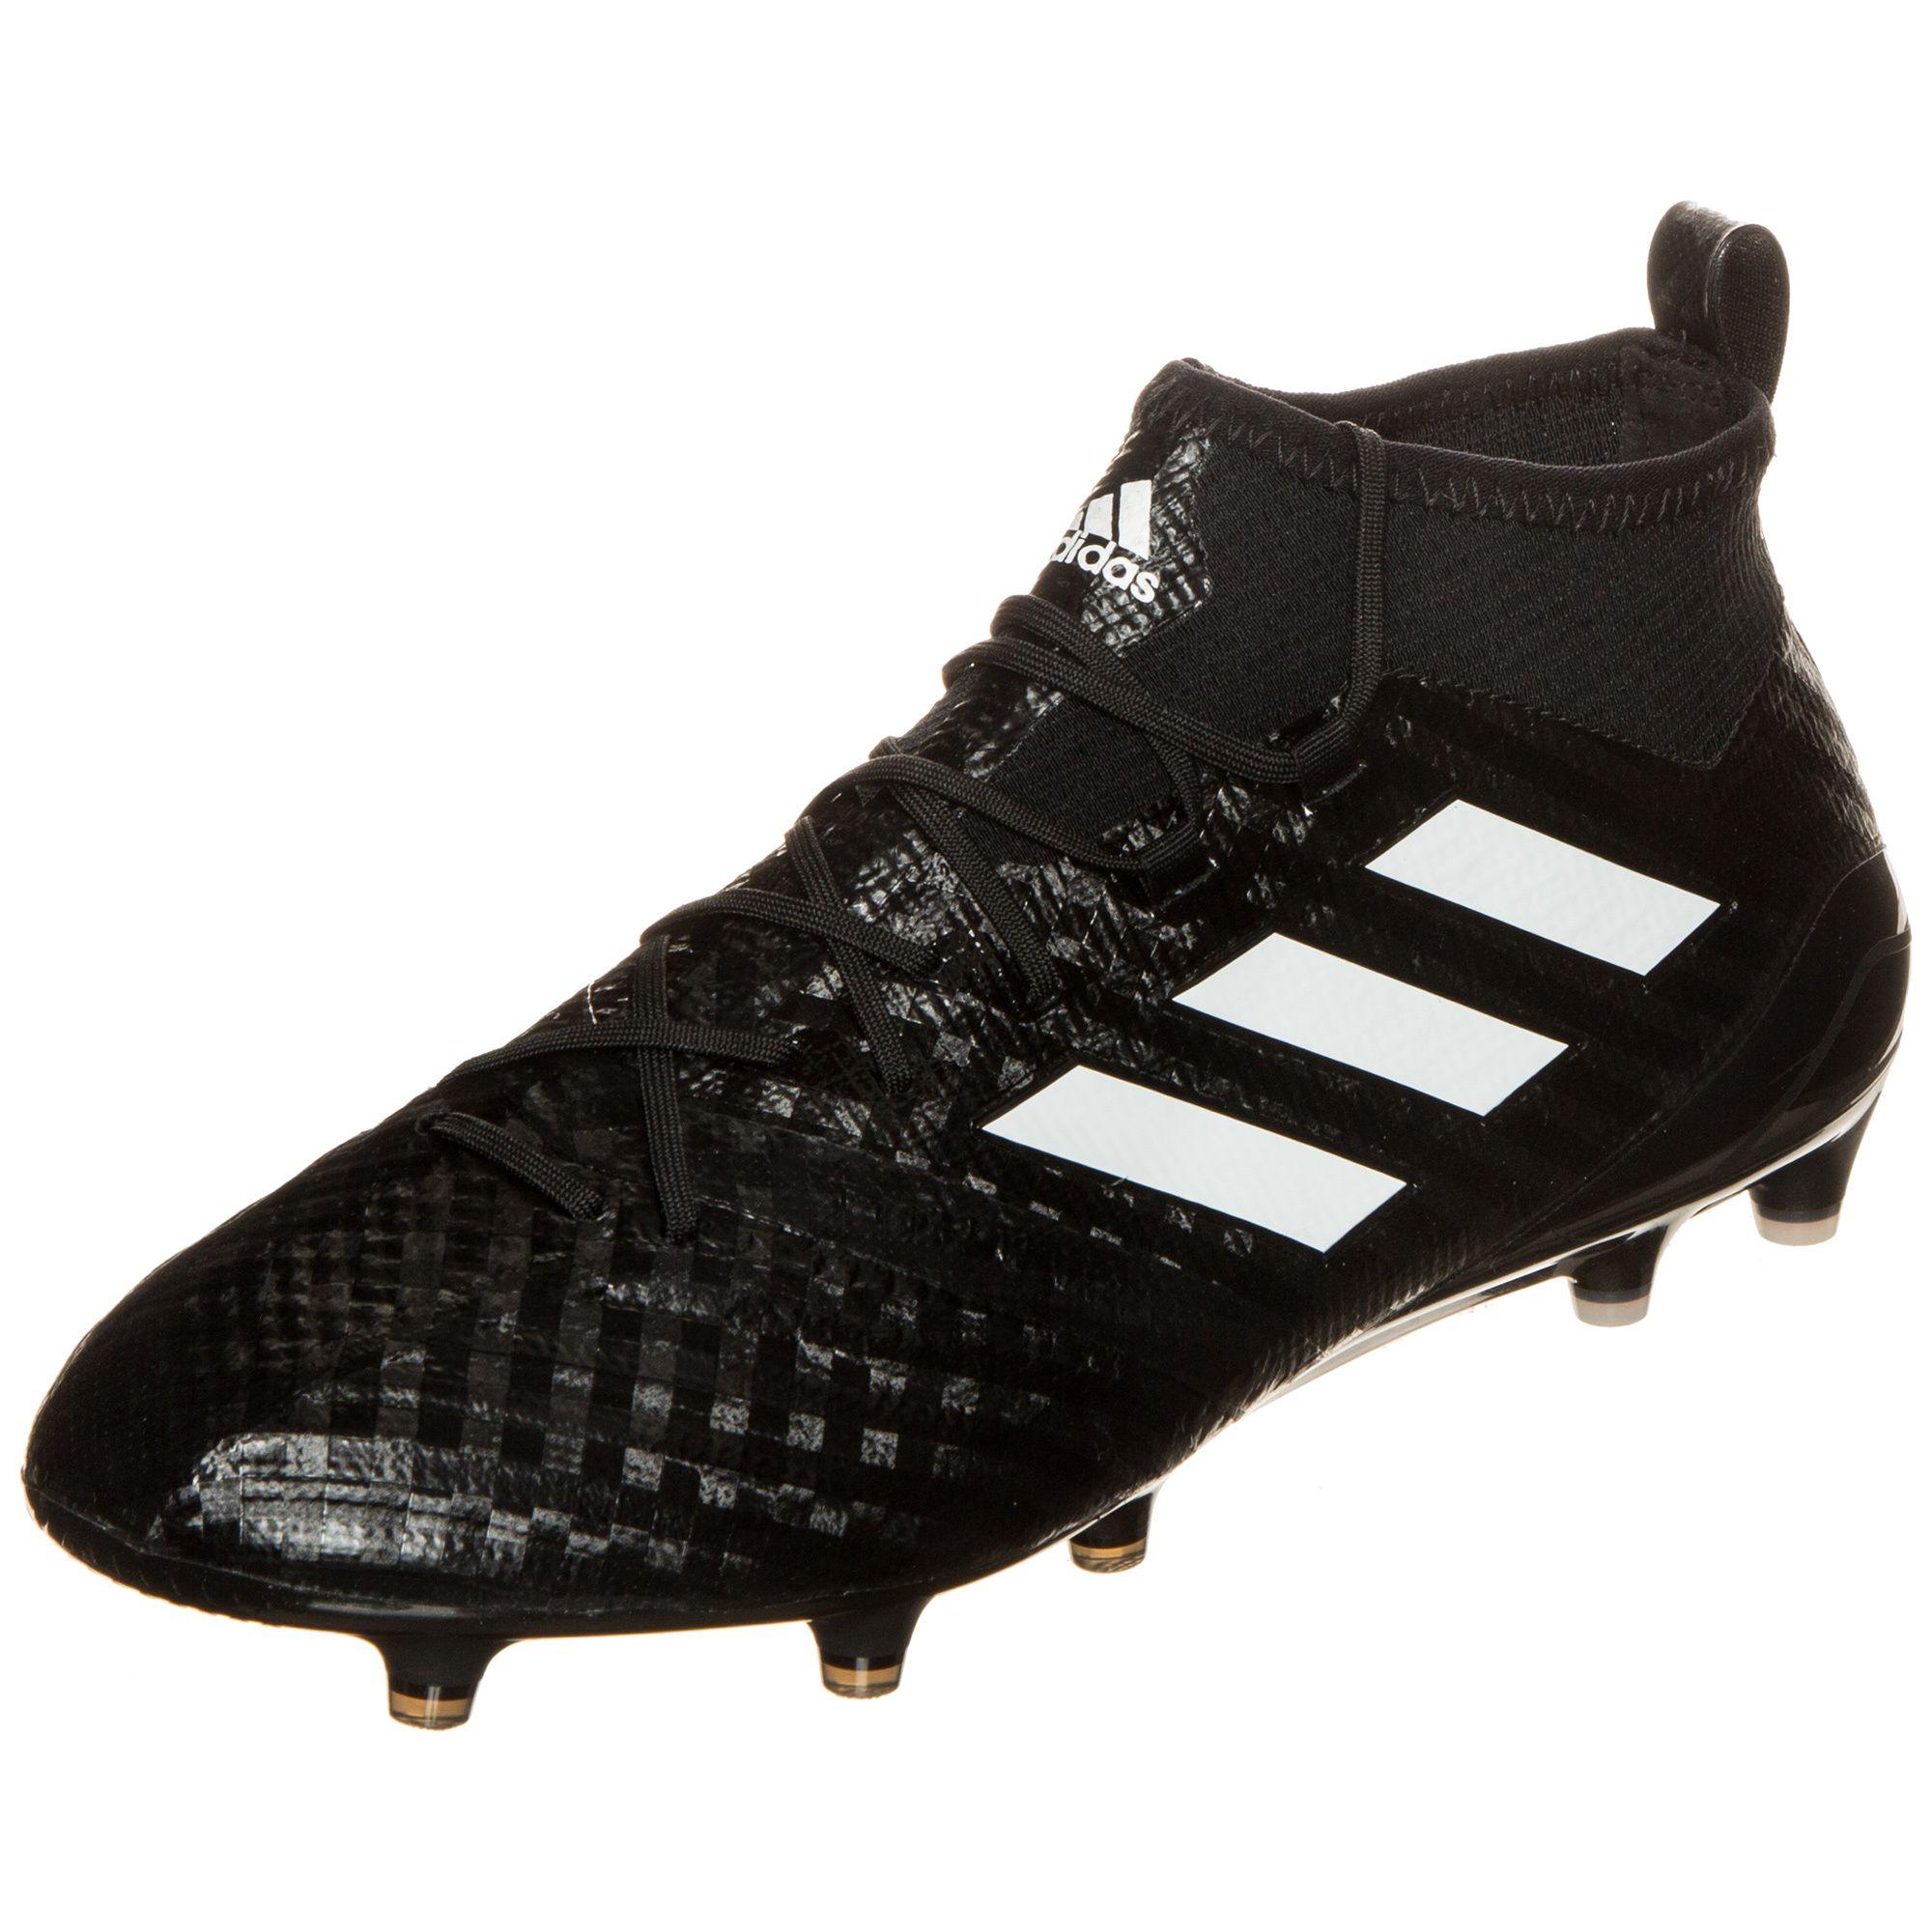 ADIDAS PERFORMANCE adidas Performance ACE 17.1 Primeknit Chequered Black FG Fußballschuh Herren